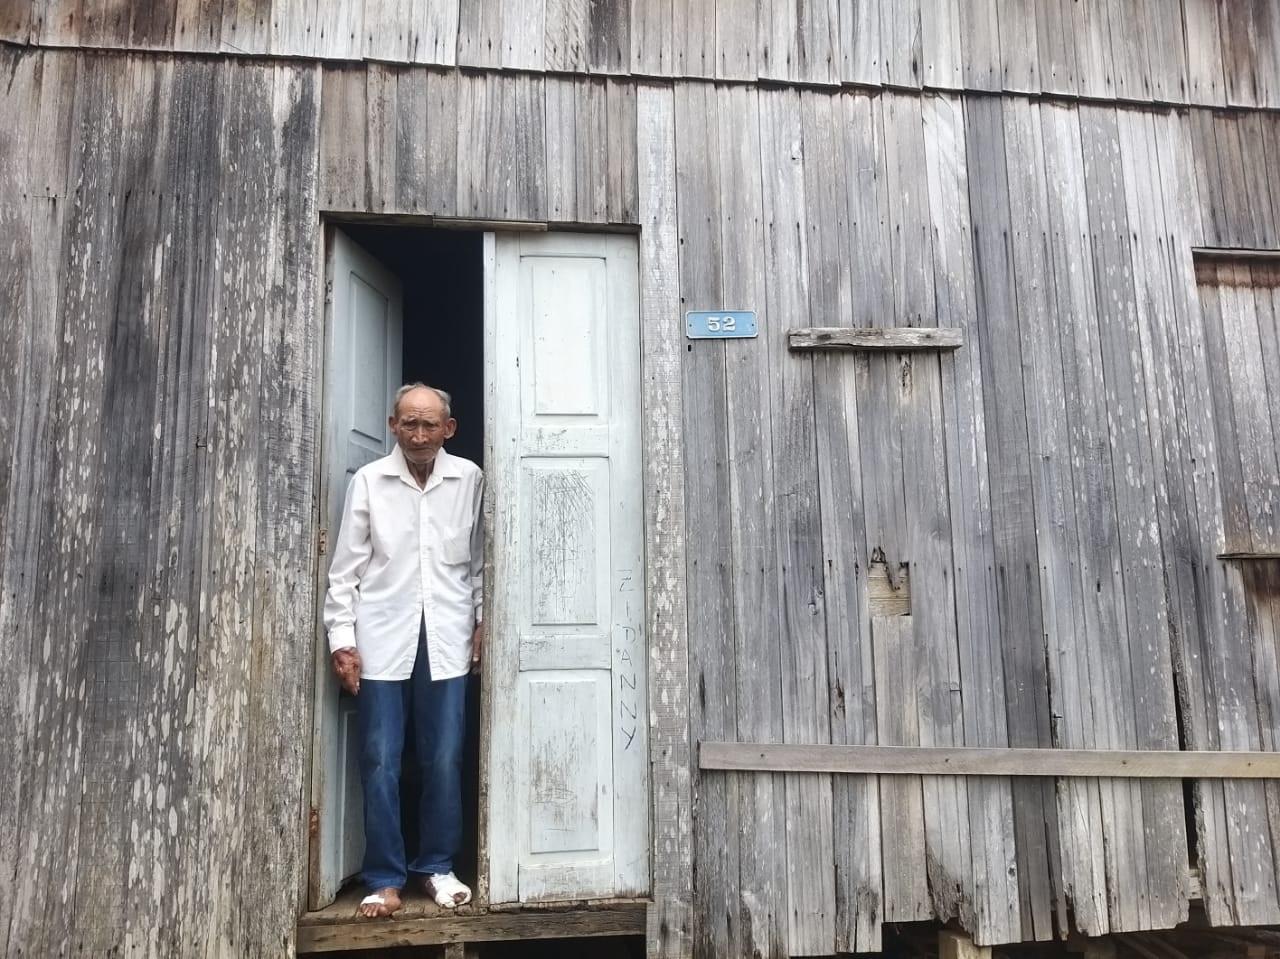 vaquinha voaa idoso vendedor de doces casa reformada